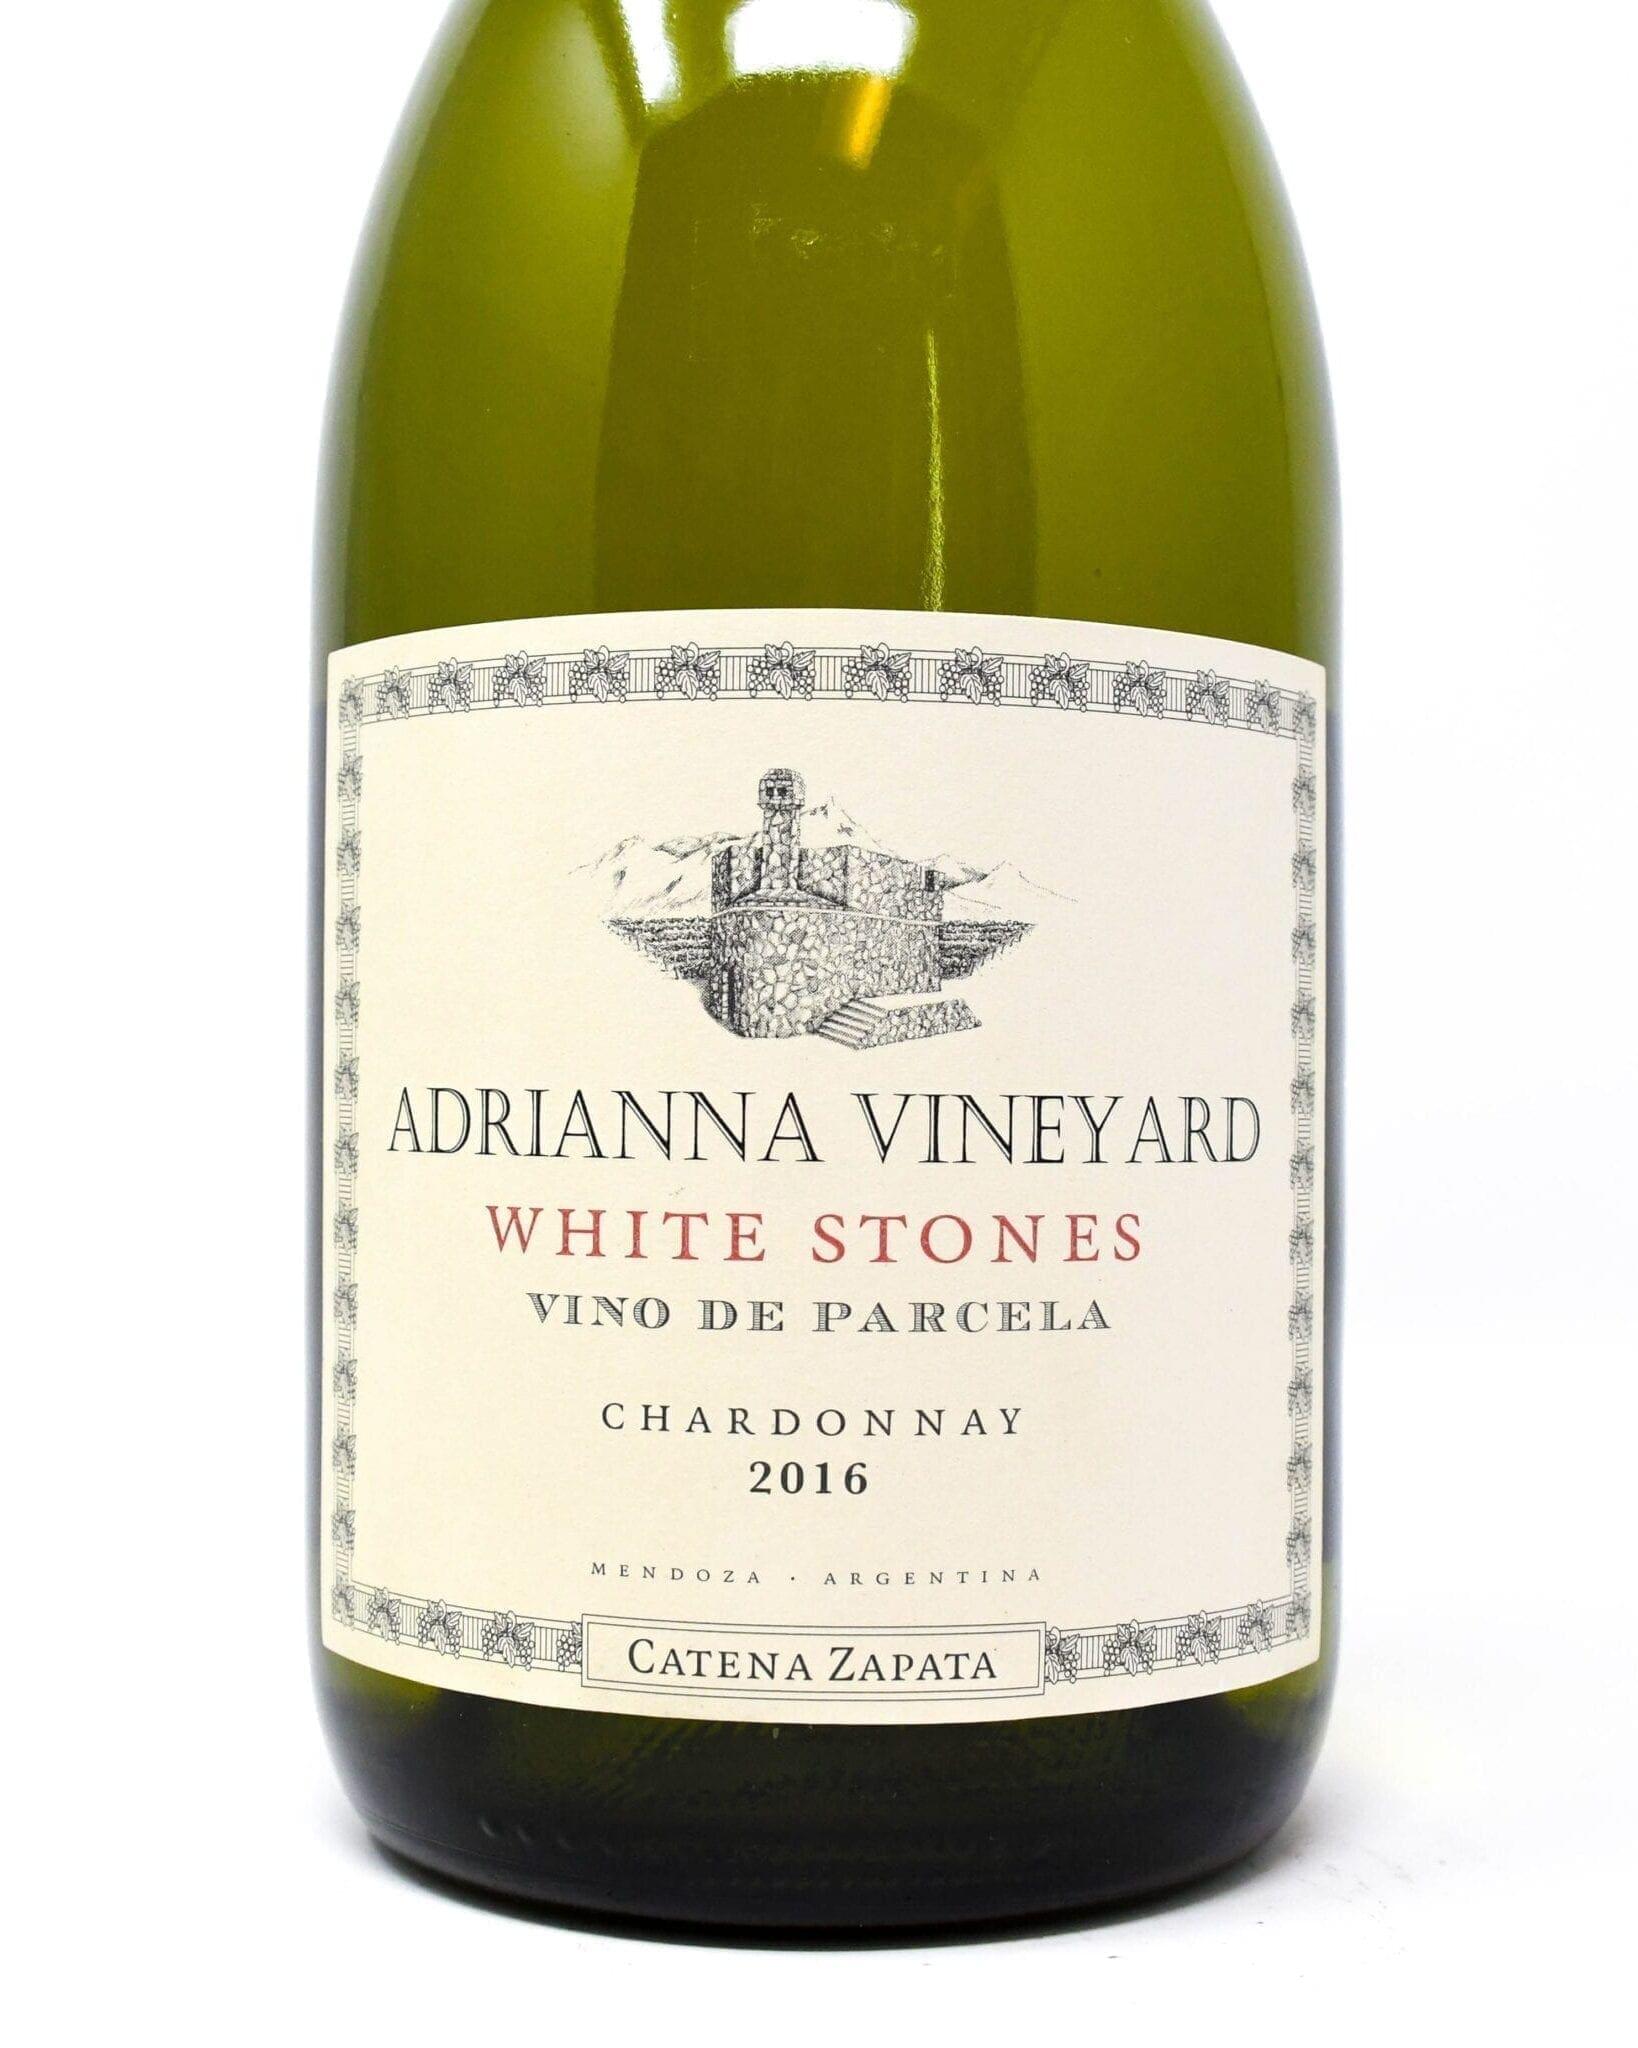 Catena Zapata, Adrianna Vineyard, White Stones, Chardonnay 2016